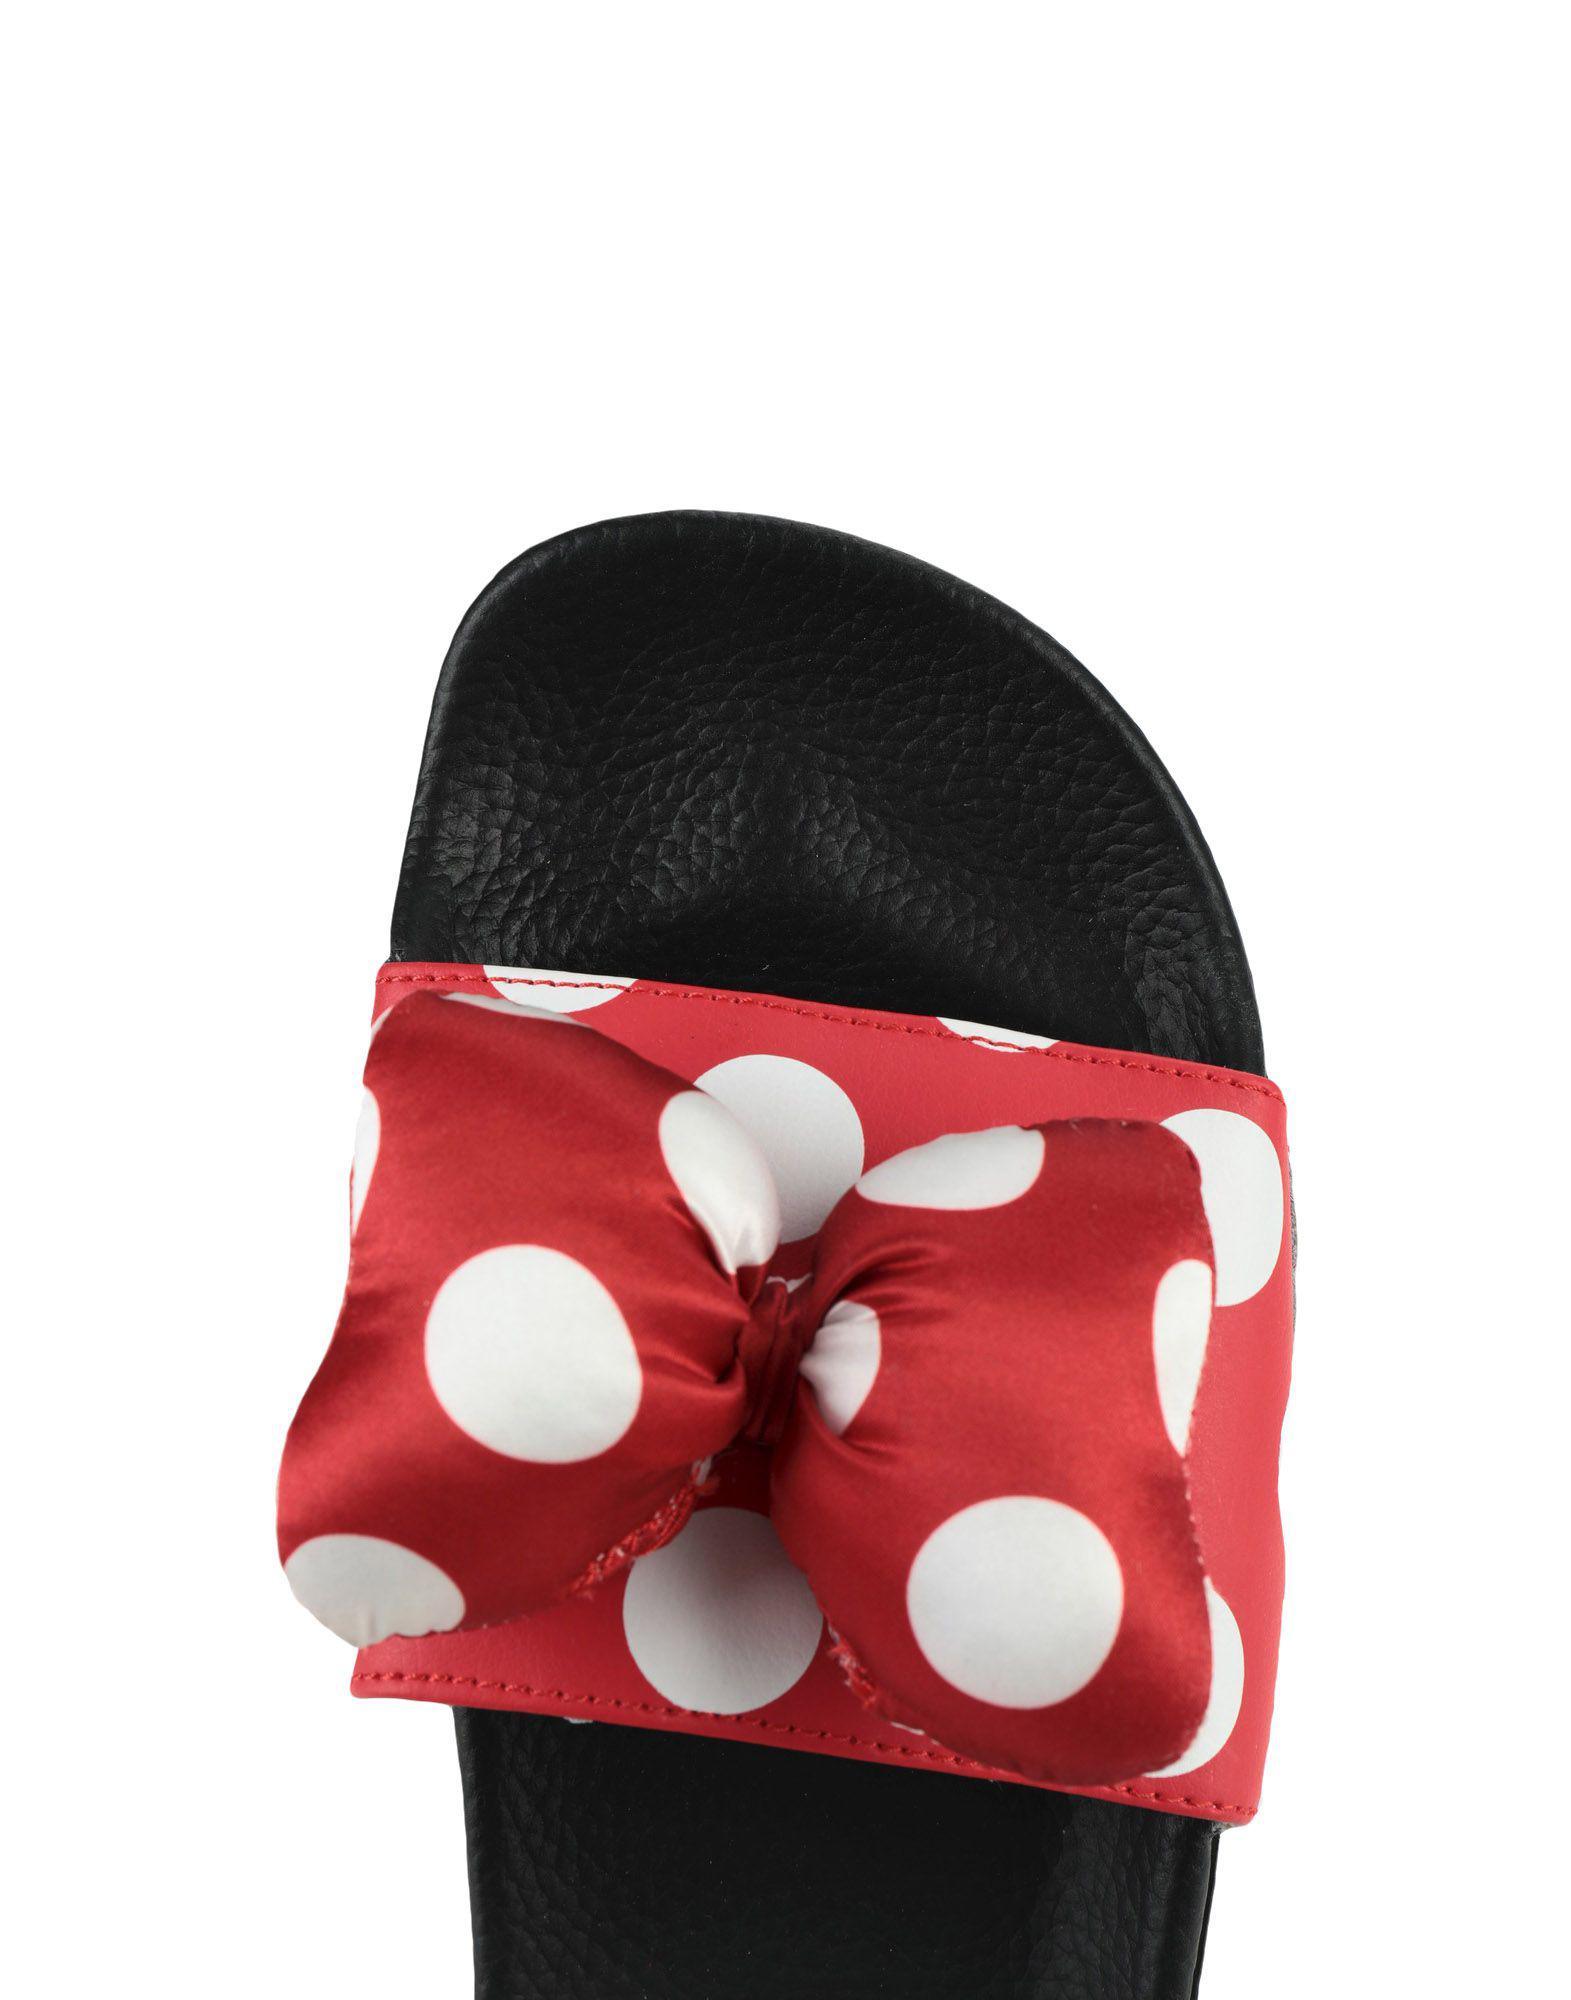 31da95cd5ec4 Lyst - Vans Sandals in Red - Save 56%